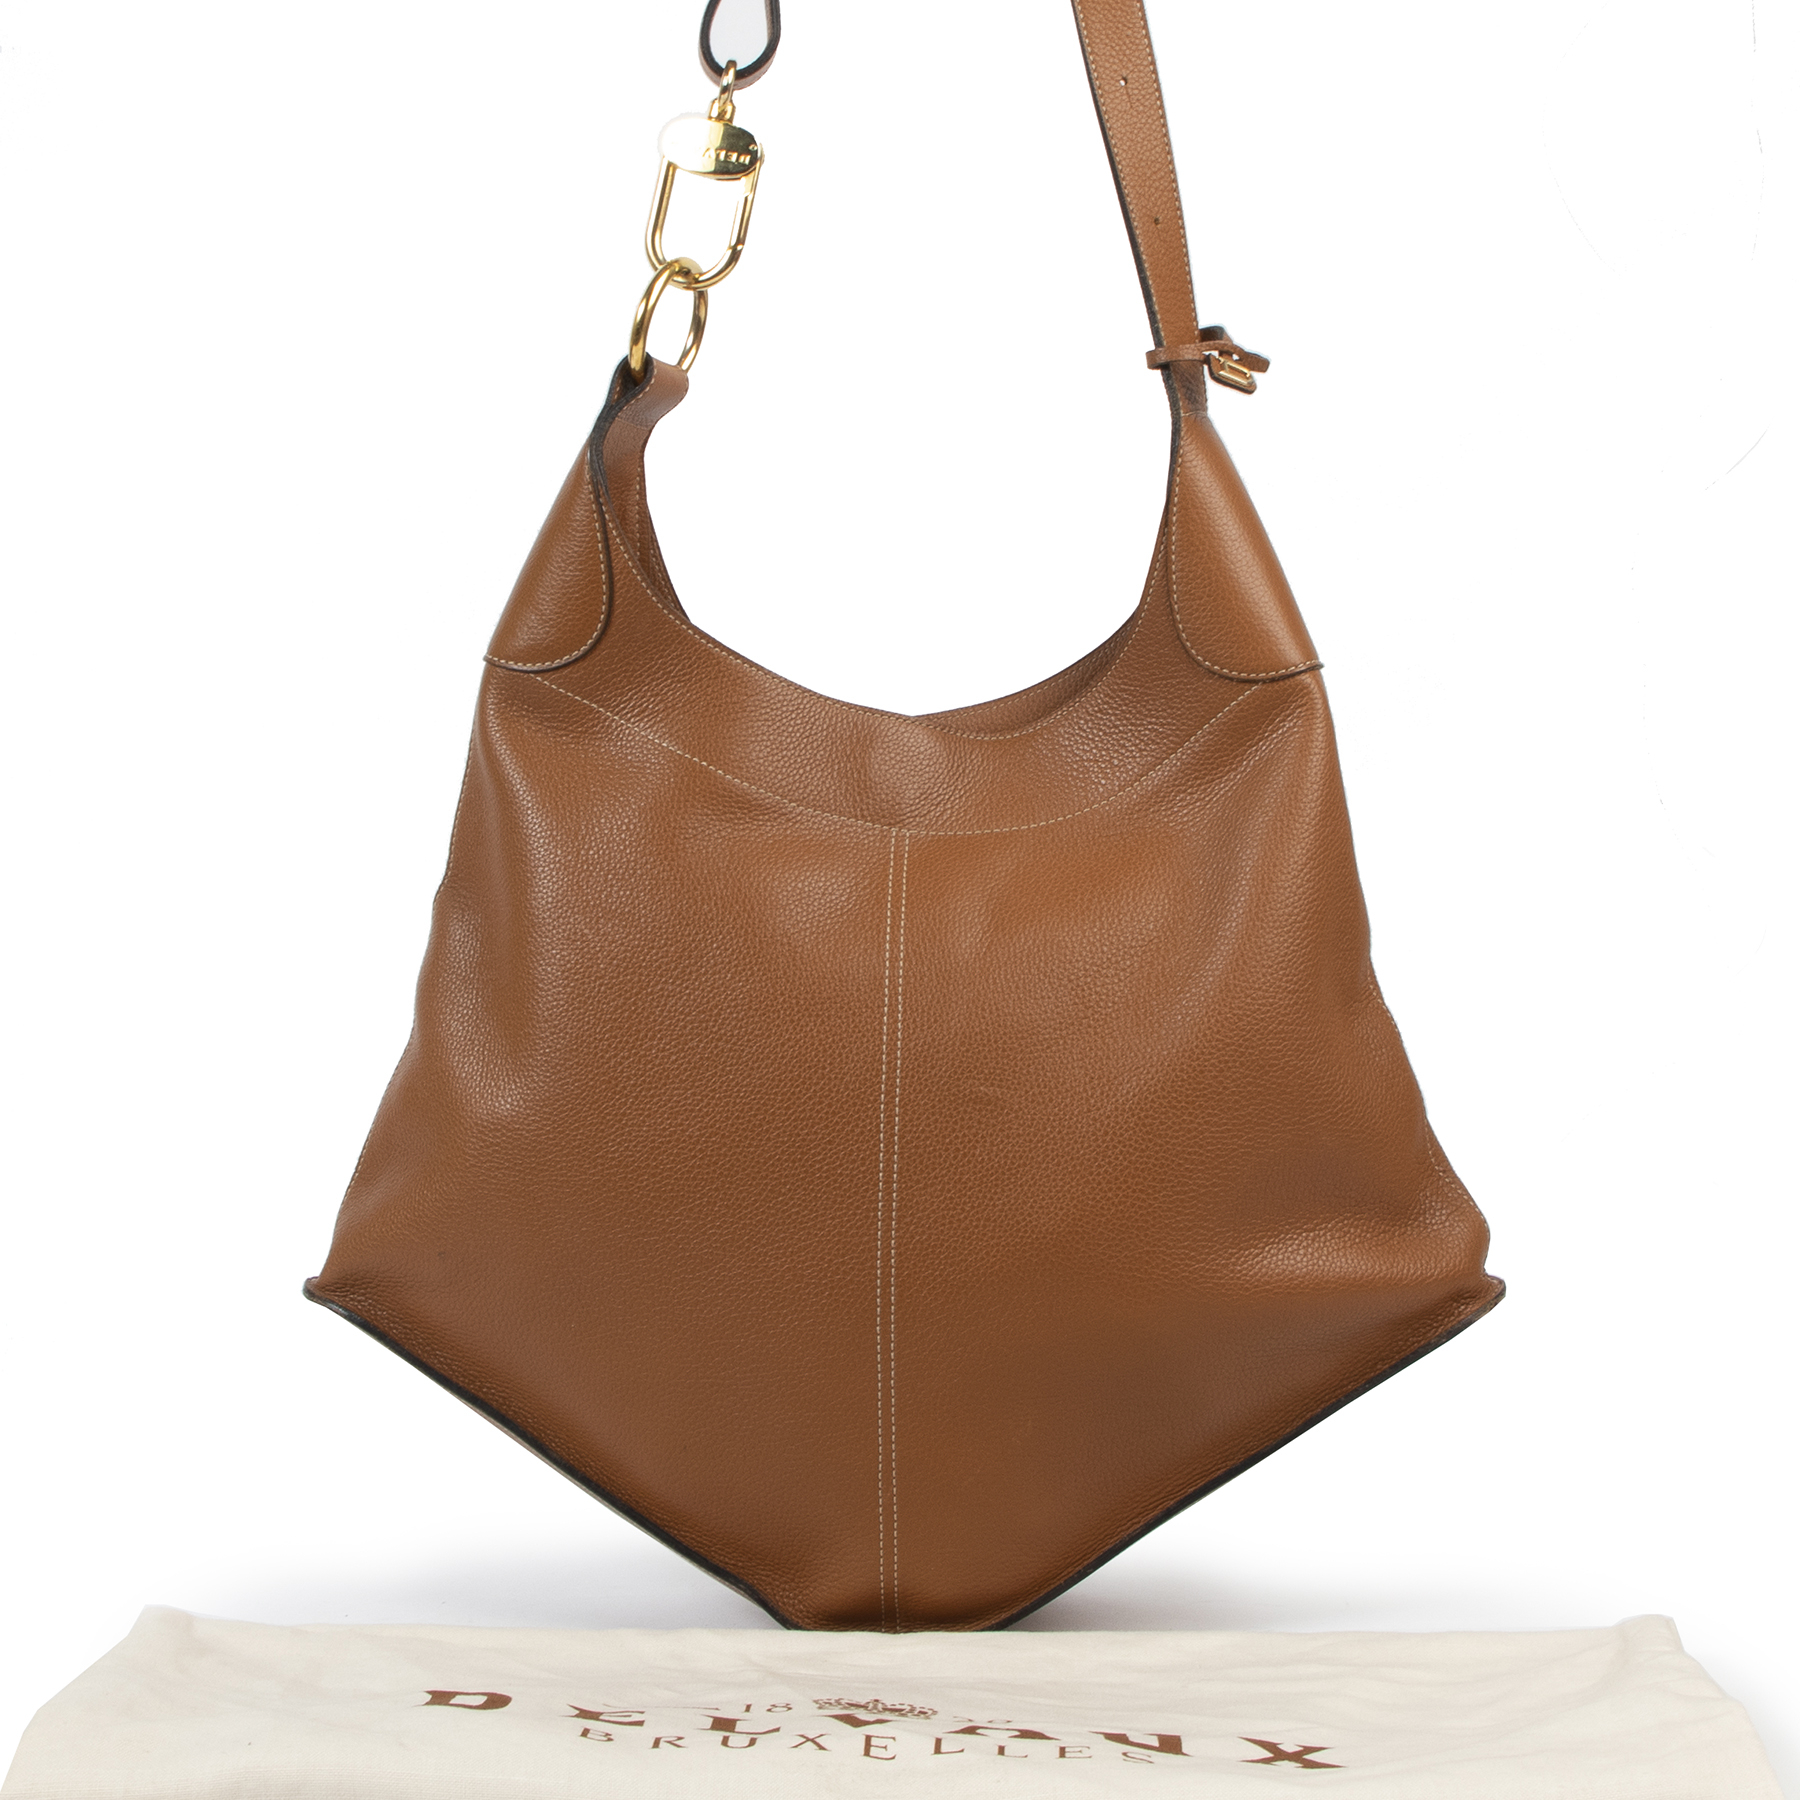 Delvaux Cognac Satan Bag